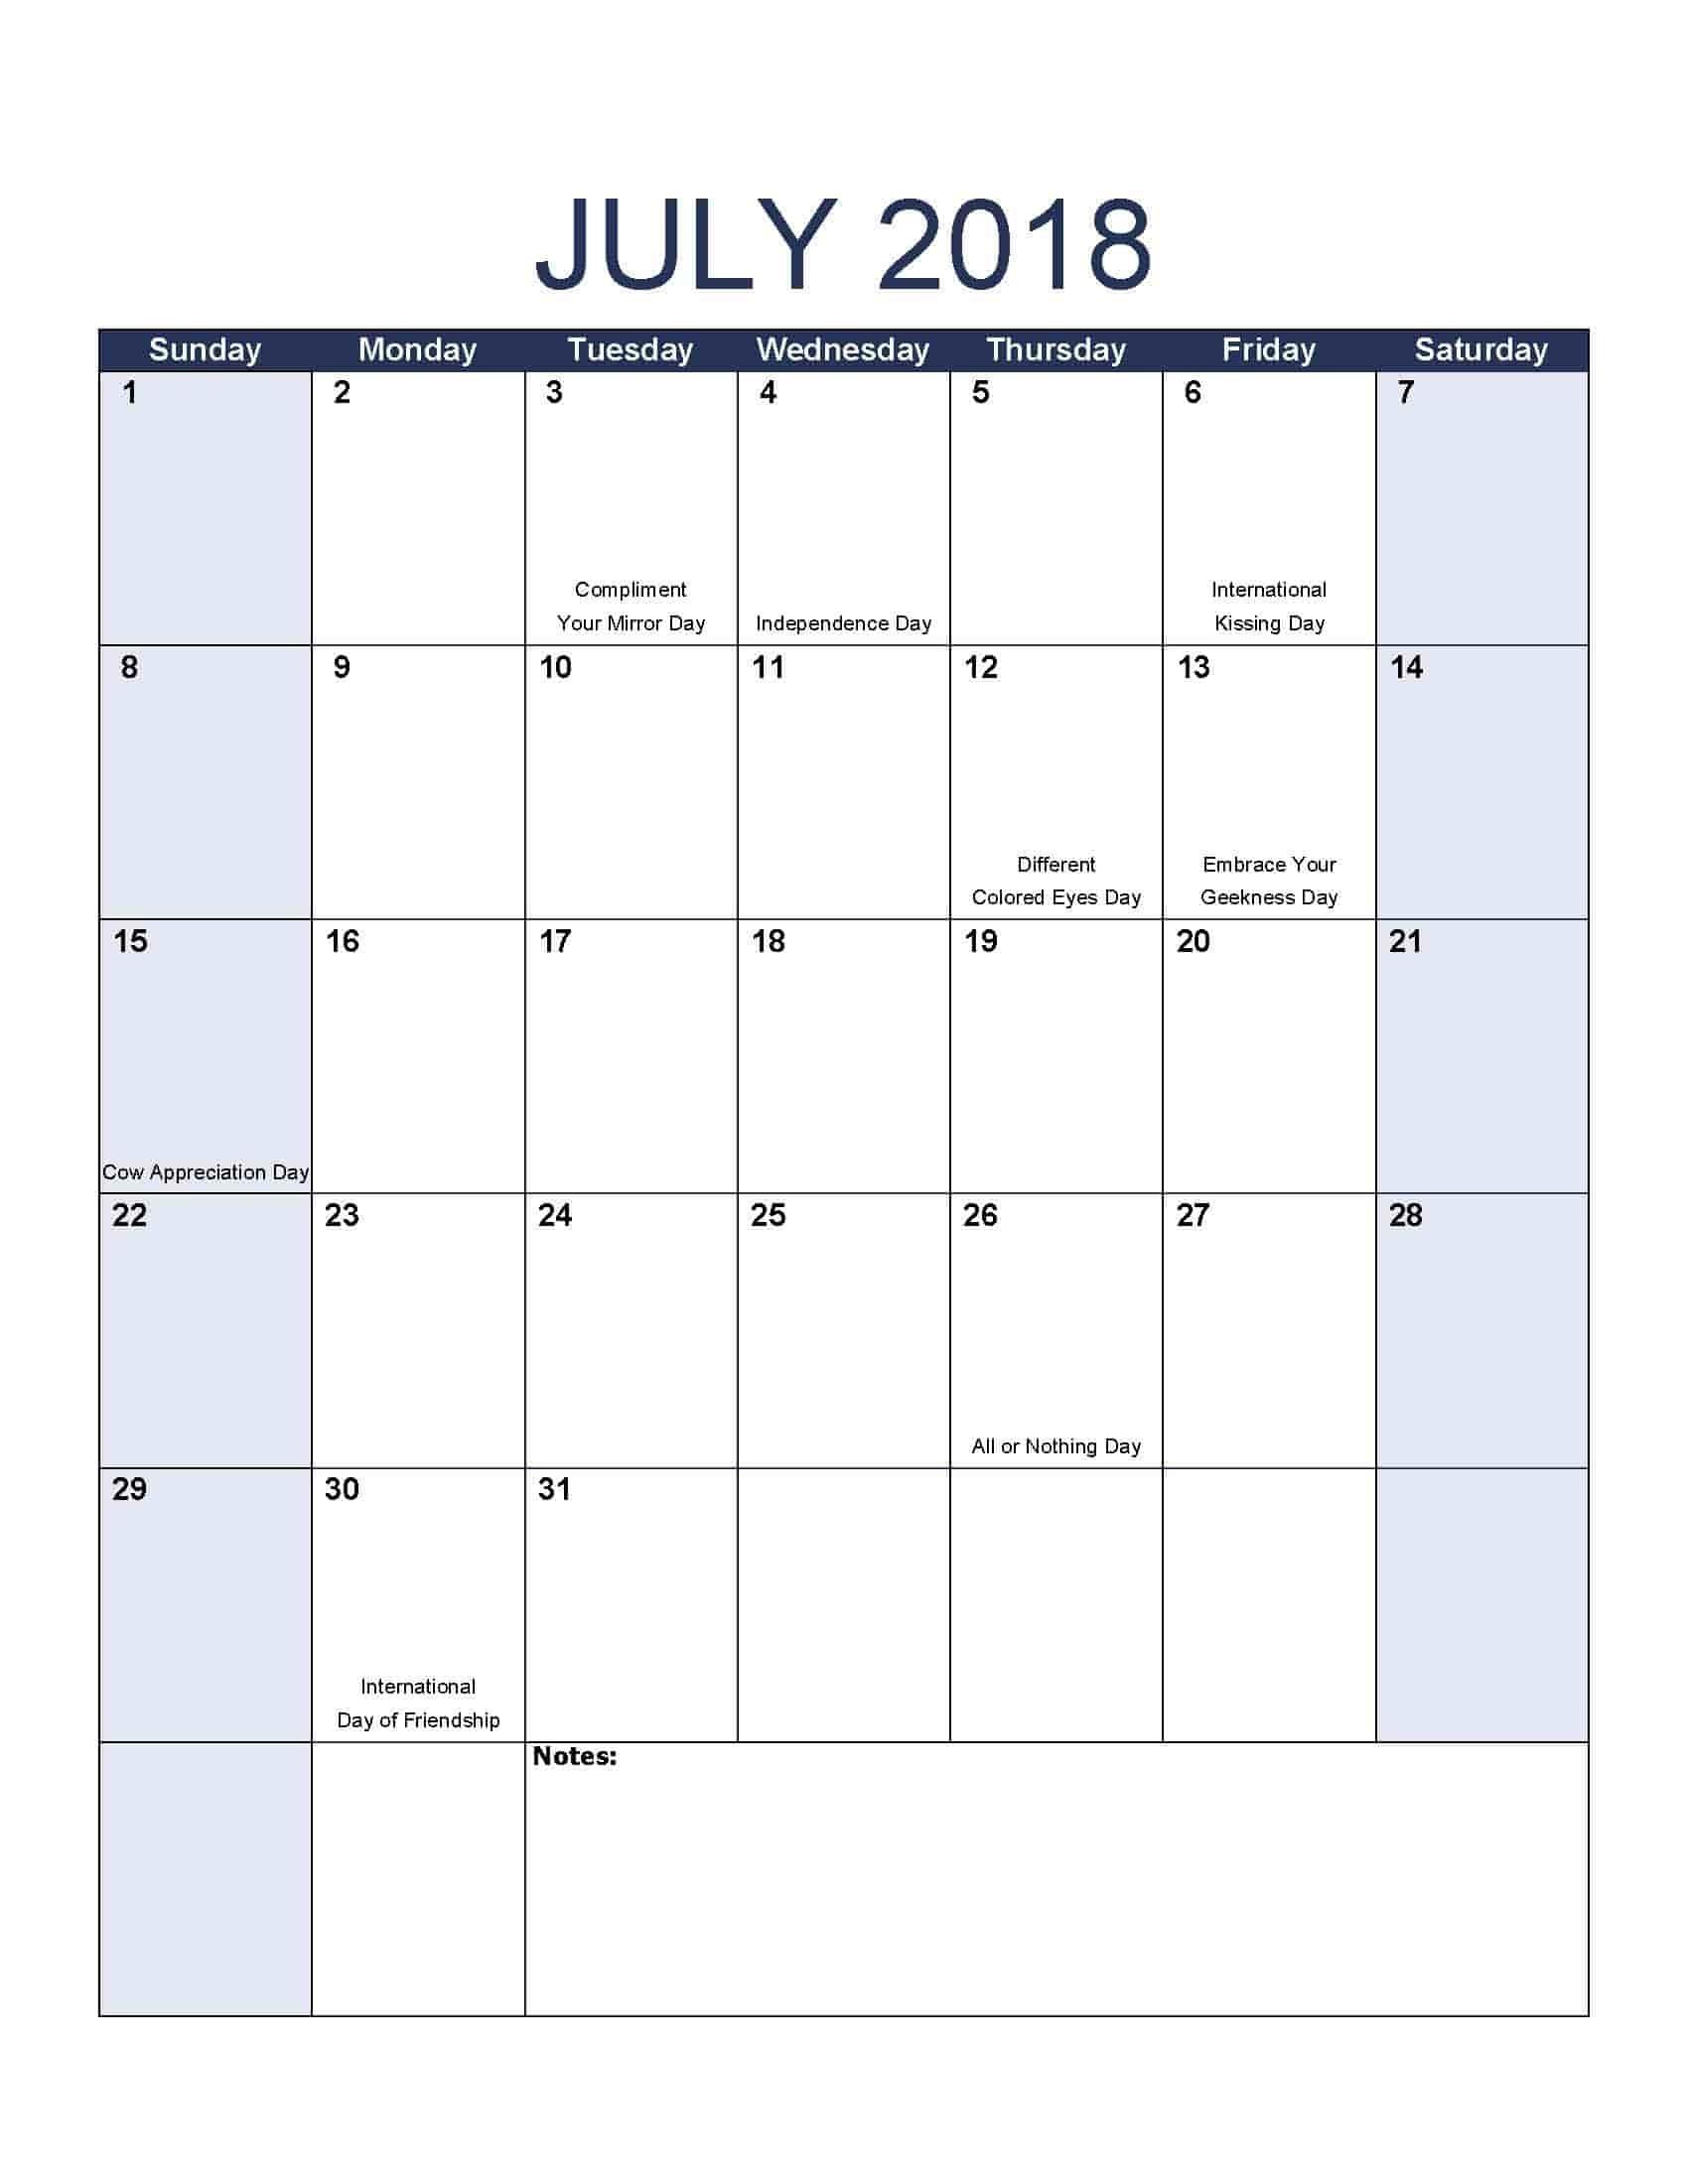 July 2018 Calendar - Free, Printable Calendar Templates-Printable Calendar With Jewish Holidays